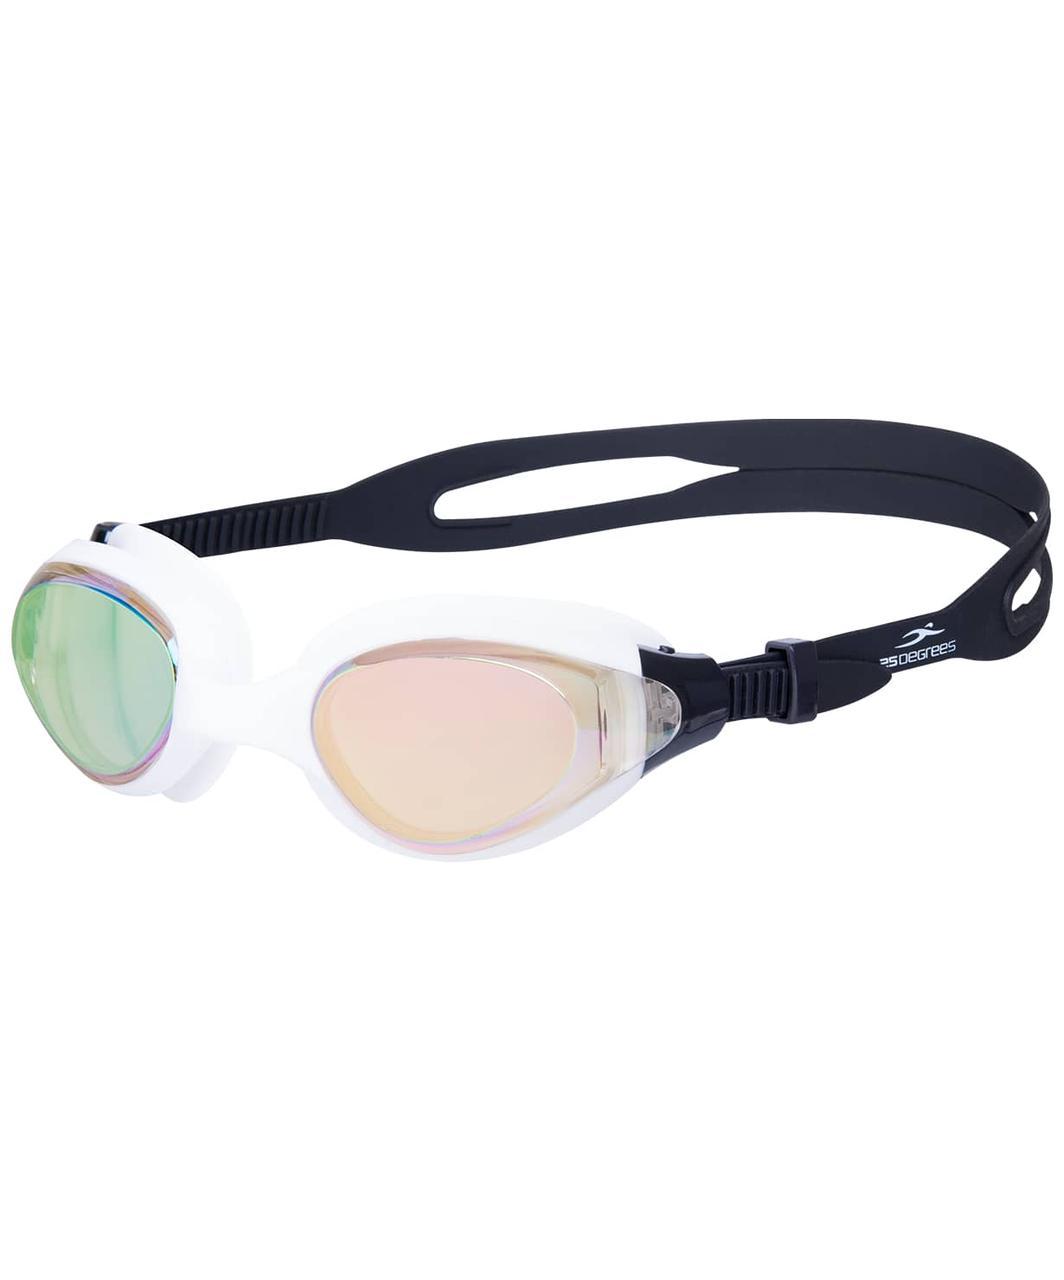 Очки для плавания Prive Mirrored White 25Degrees